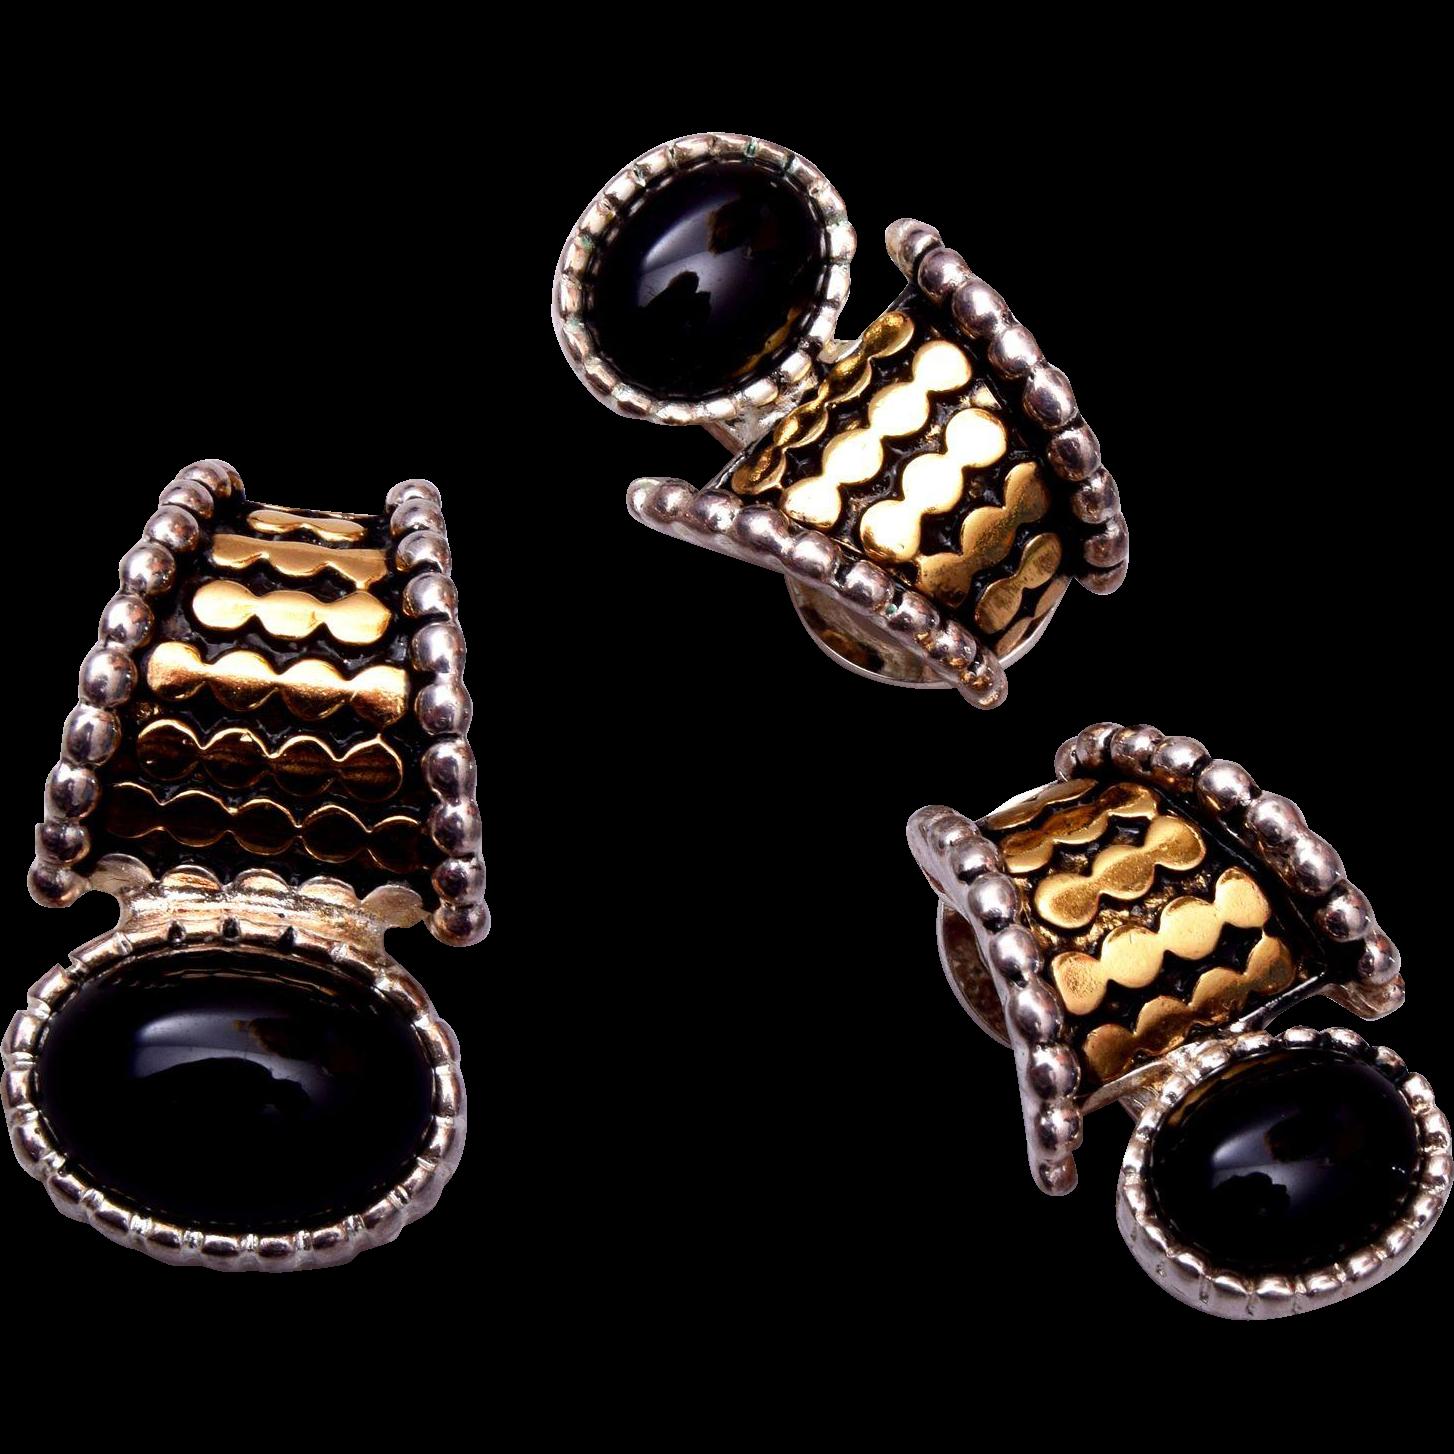 Premier Designs 2-Tone Pendant and Earring Set